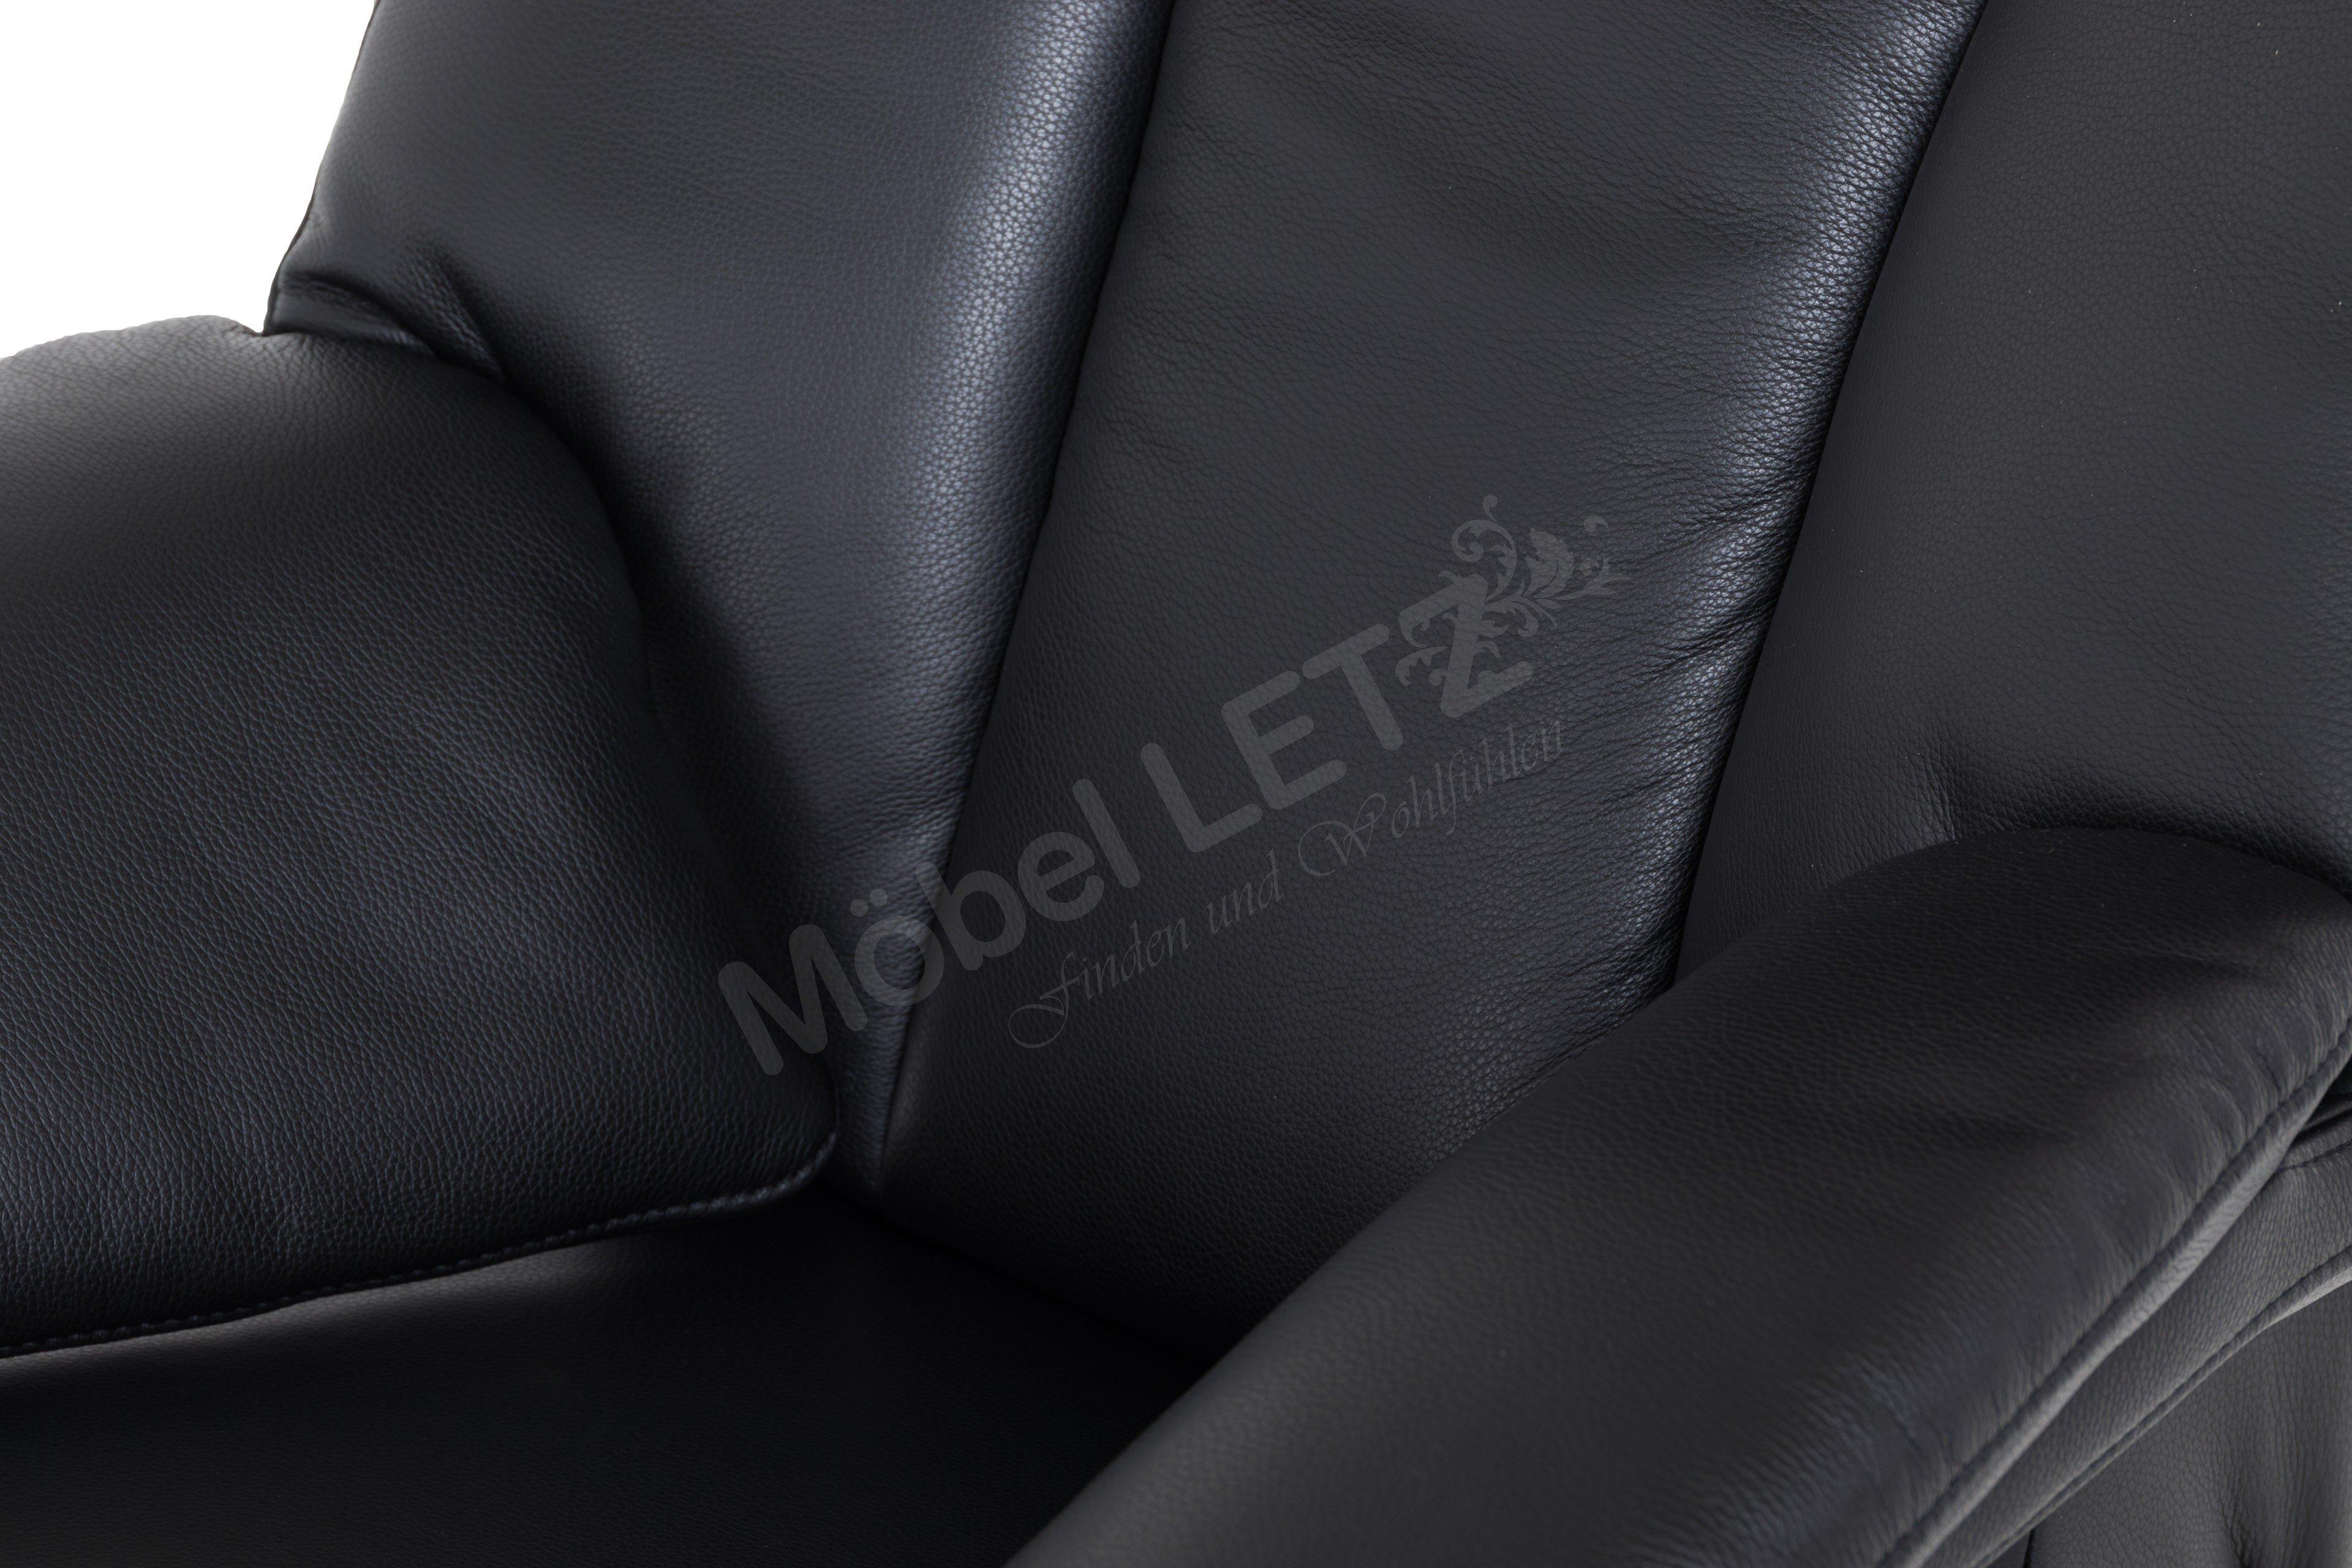 Hukla Cosyrelax Cr 04 Relaxssessel In Schwarz Möbel Letz Ihr